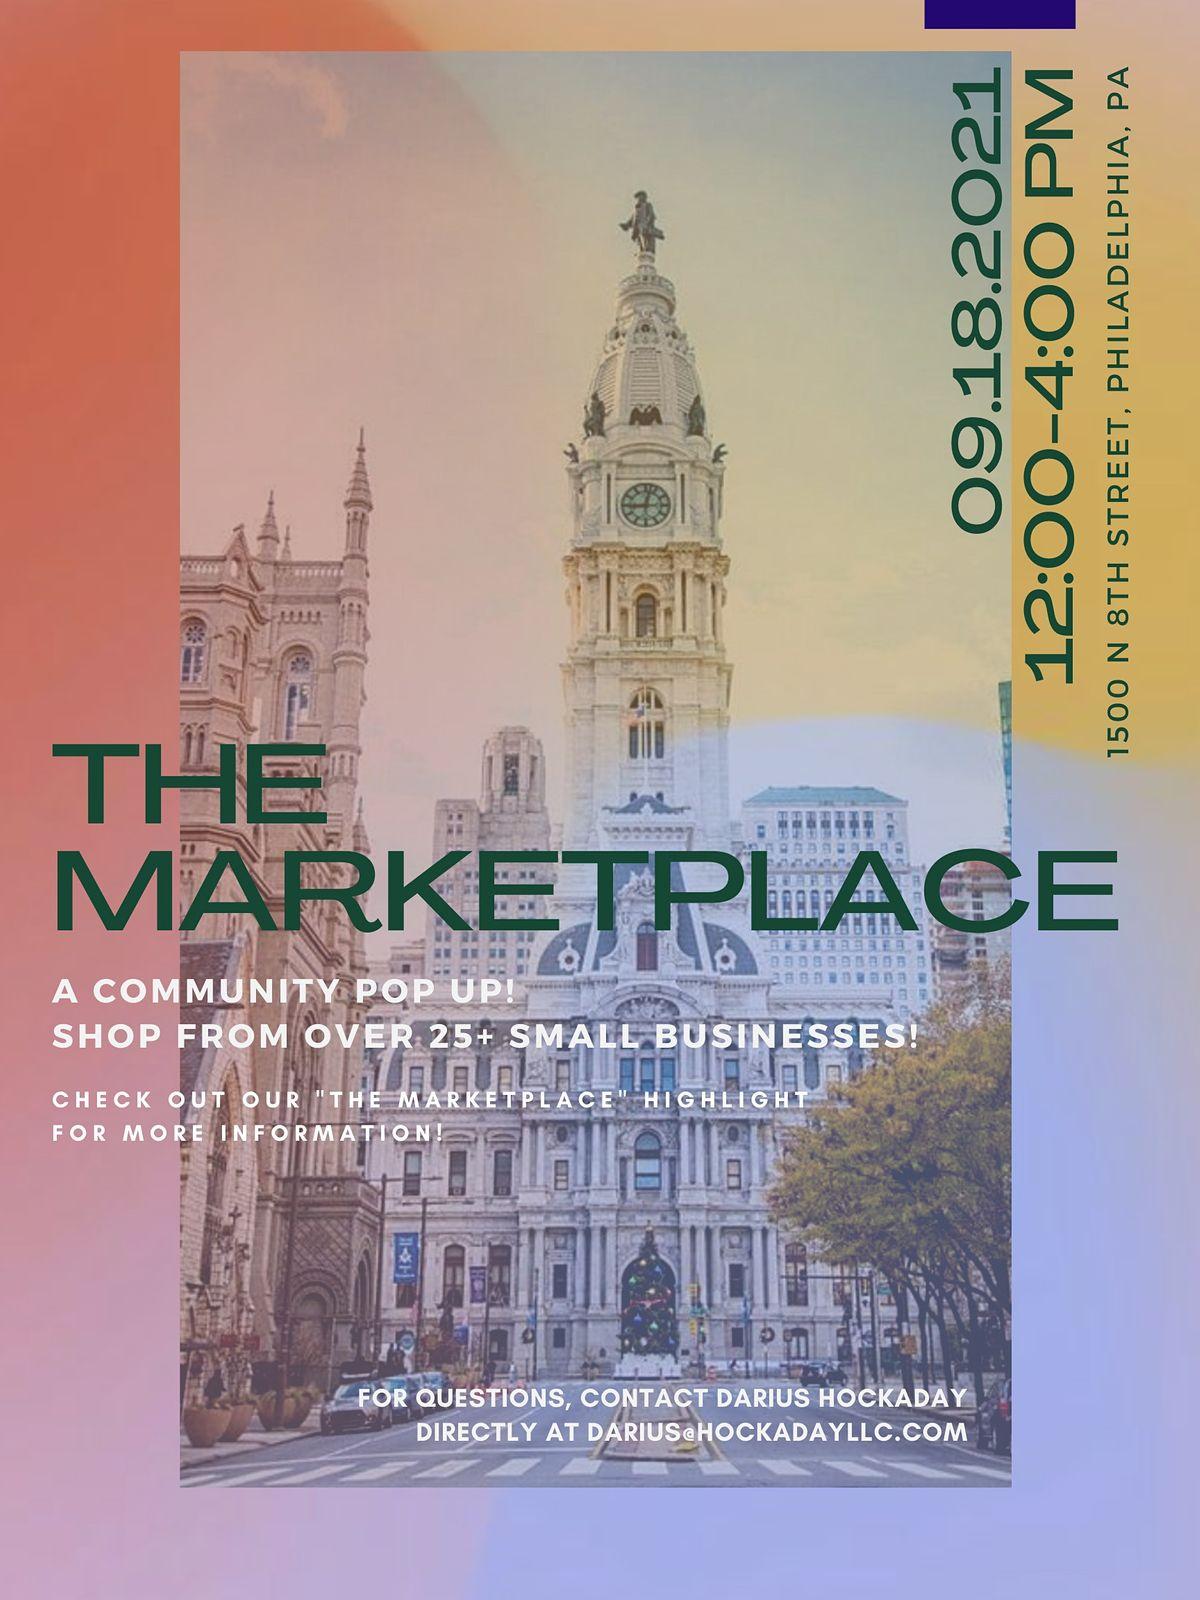 The Marketplace: Community Pop Up